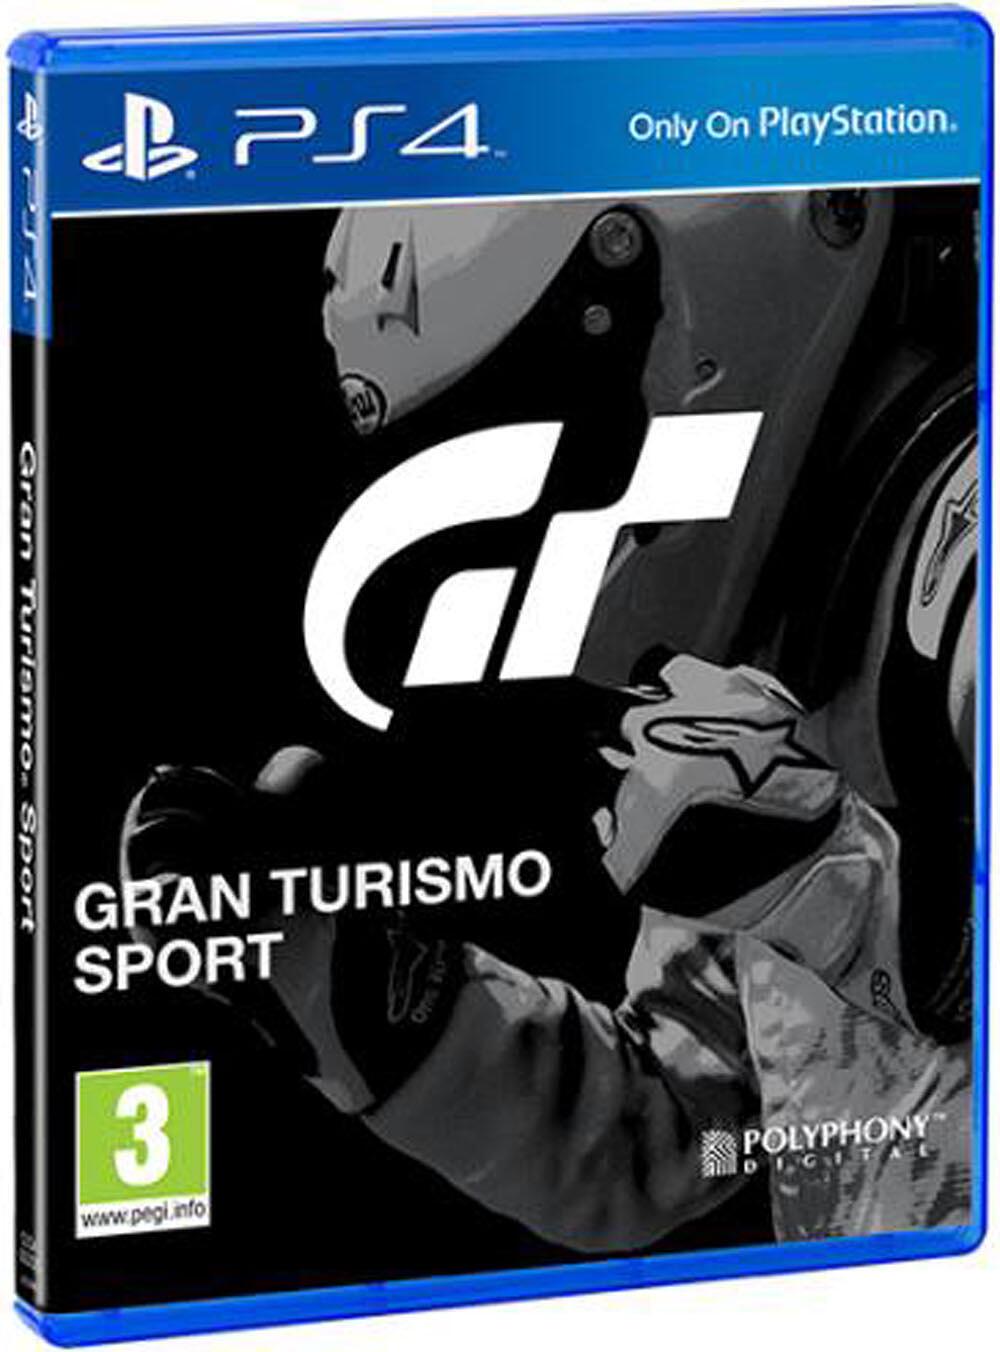 Gran Turismo : The real driving simulator : Sport |